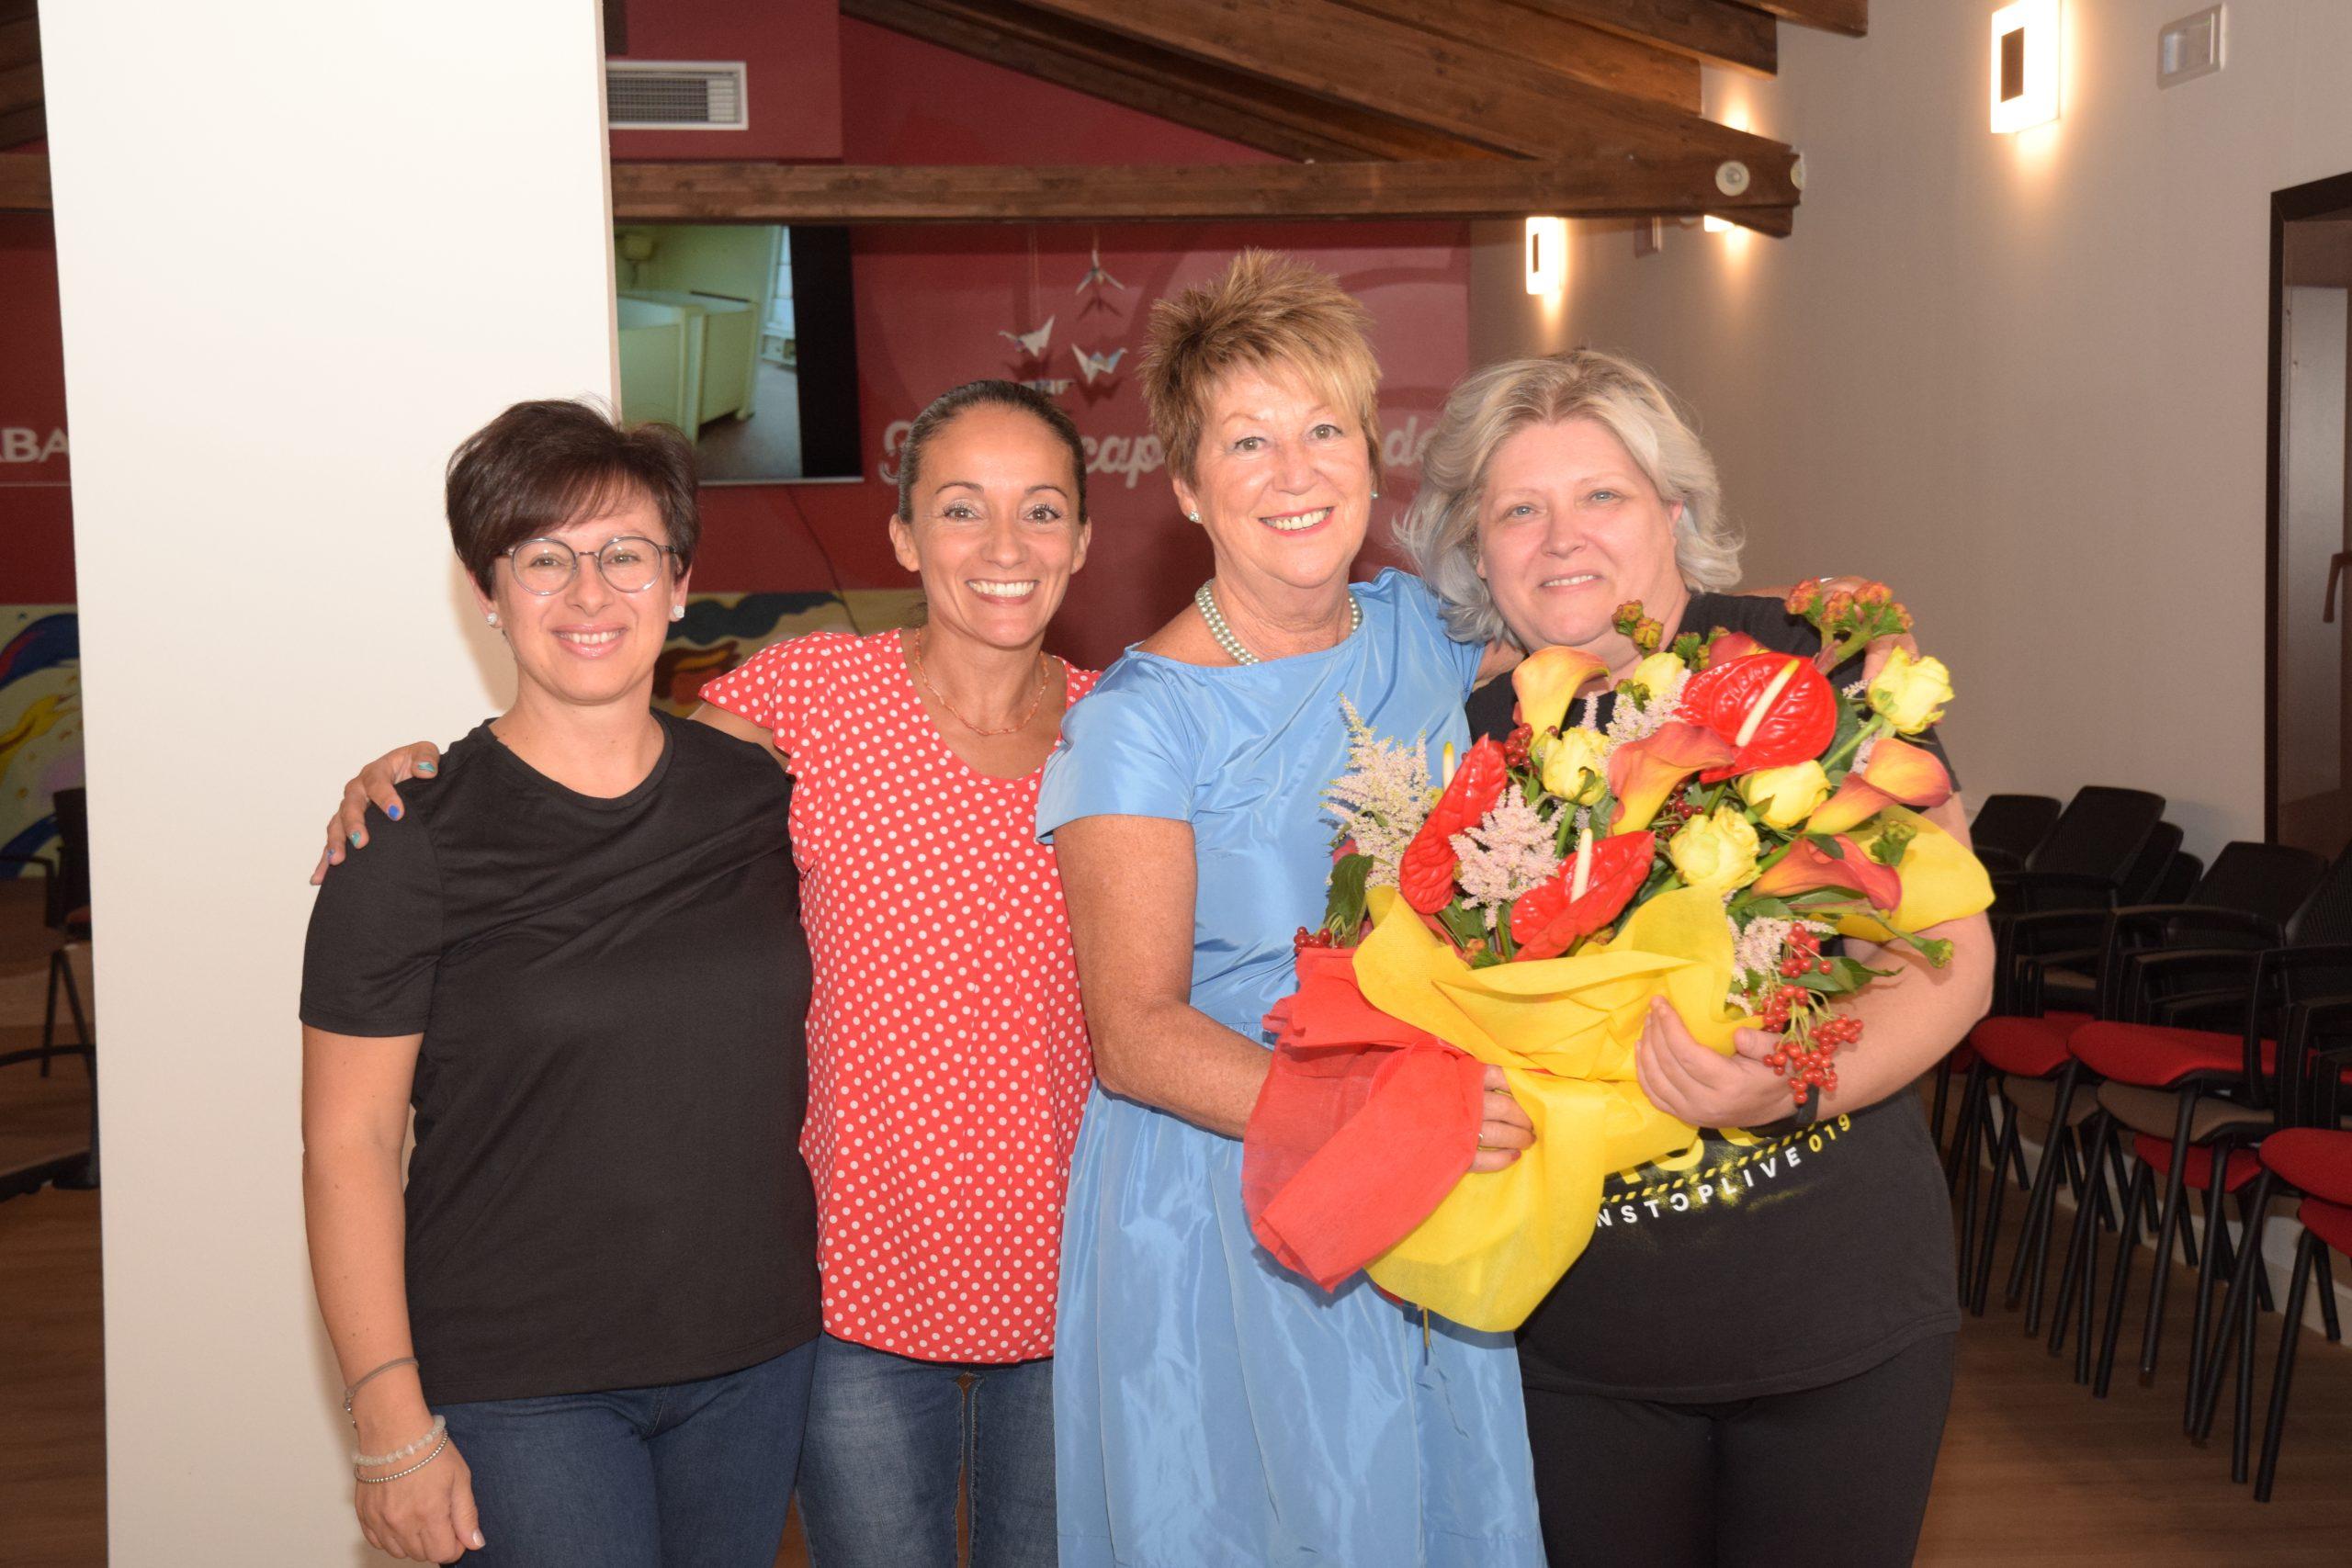 13 sett 2019 – con Silvia Urli, Samantha Ribeca, Monia Cappellaro